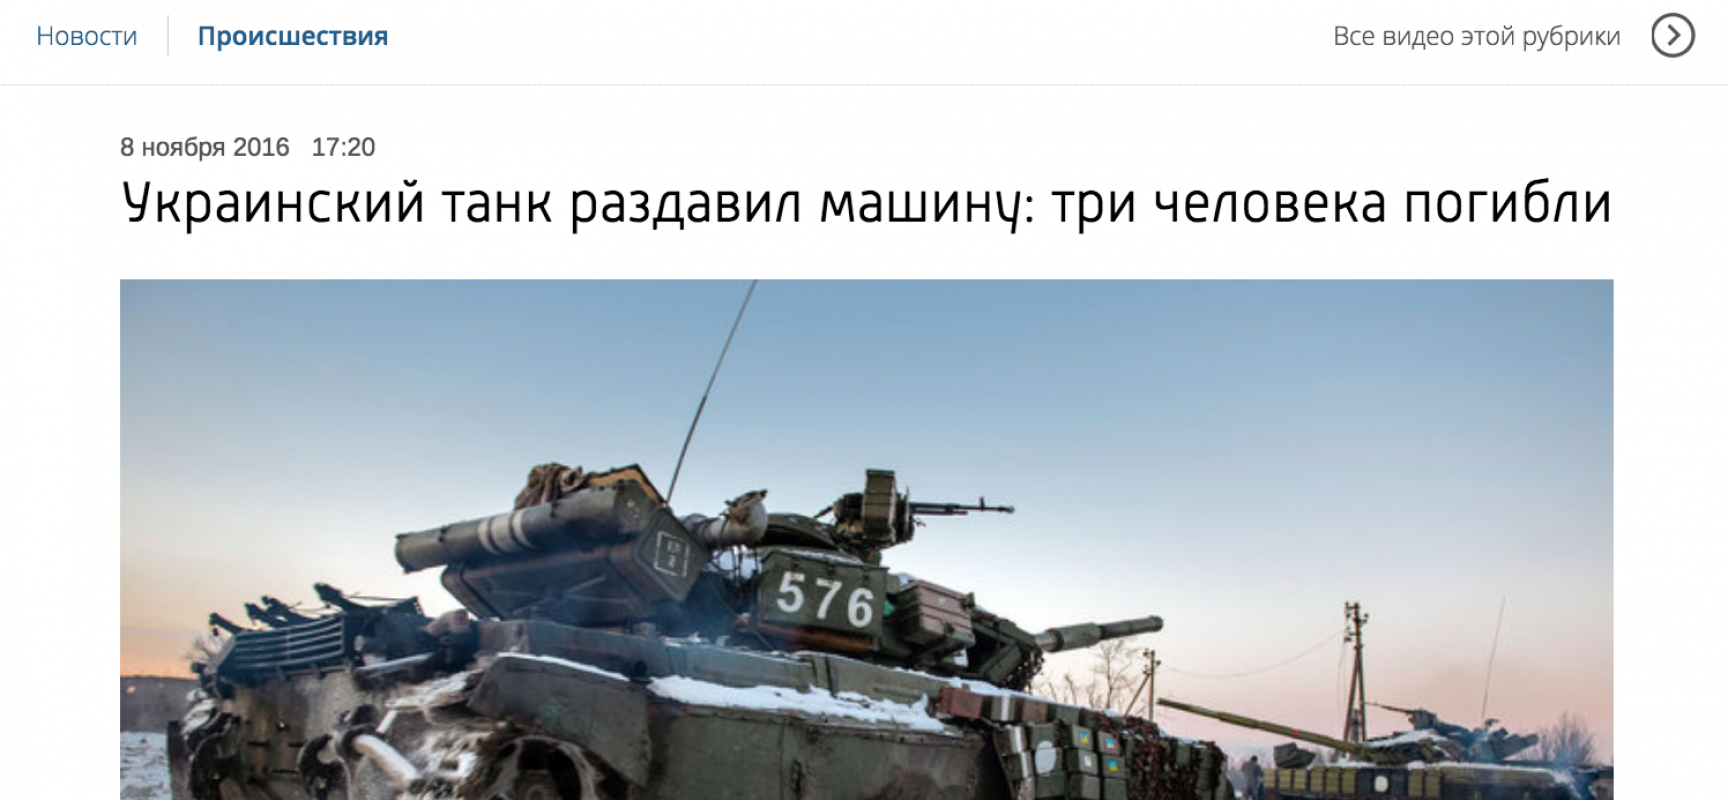 Ucraina, soldati ubriachi provocano incidente (Fake)